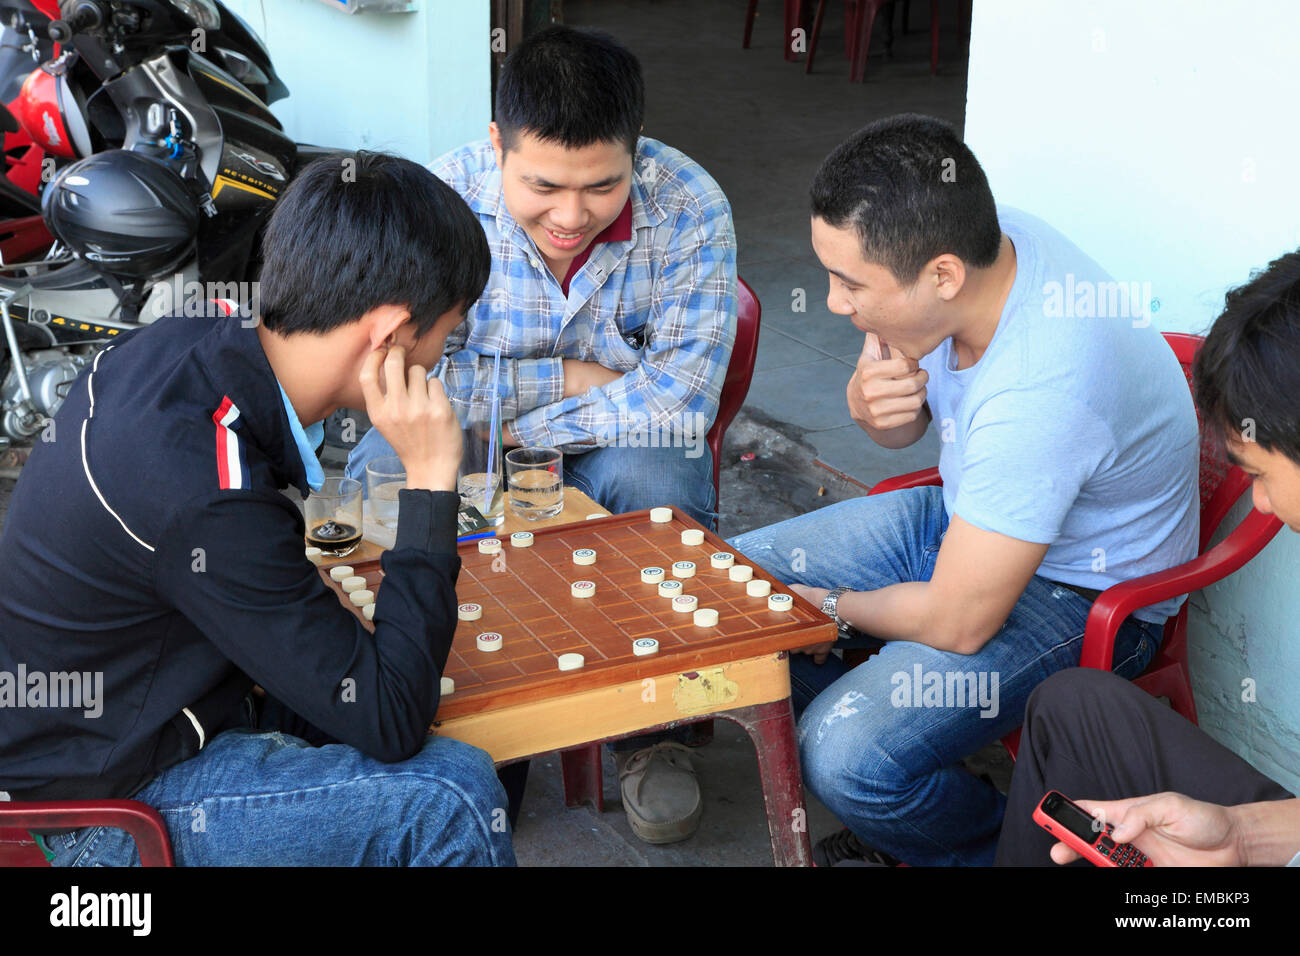 Vietnam, Hoi An, men playing chinese chess, - Stock Image